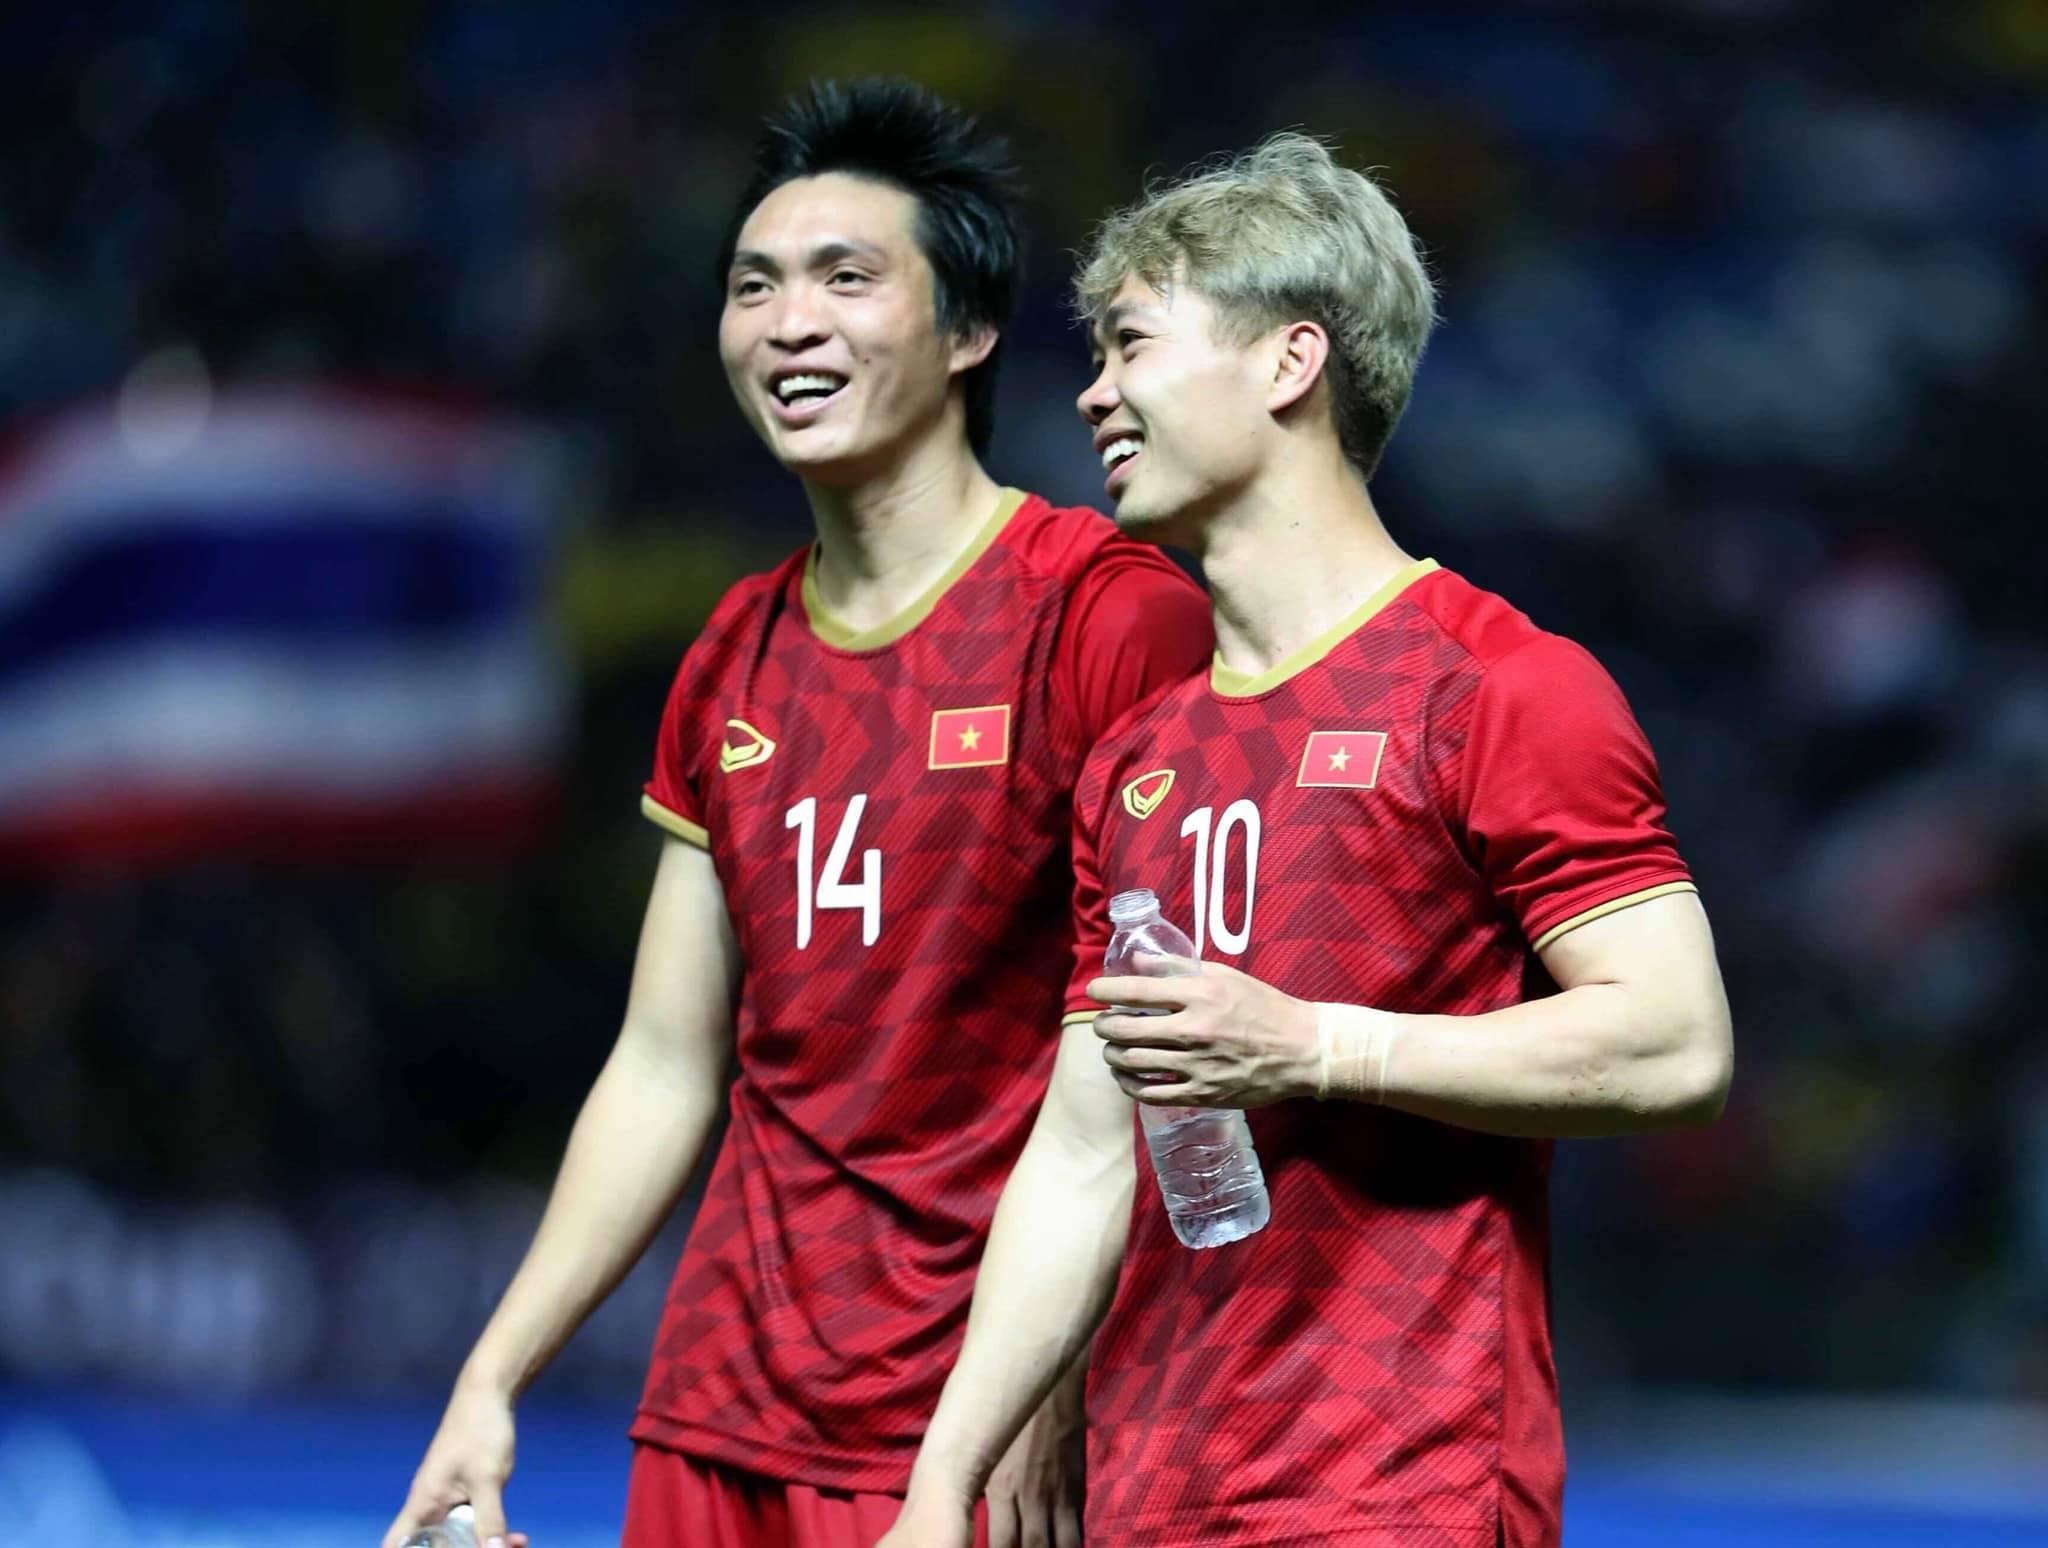 Nguyen Cong Phuong Nguyen Tuan Anh King's Cup 2019